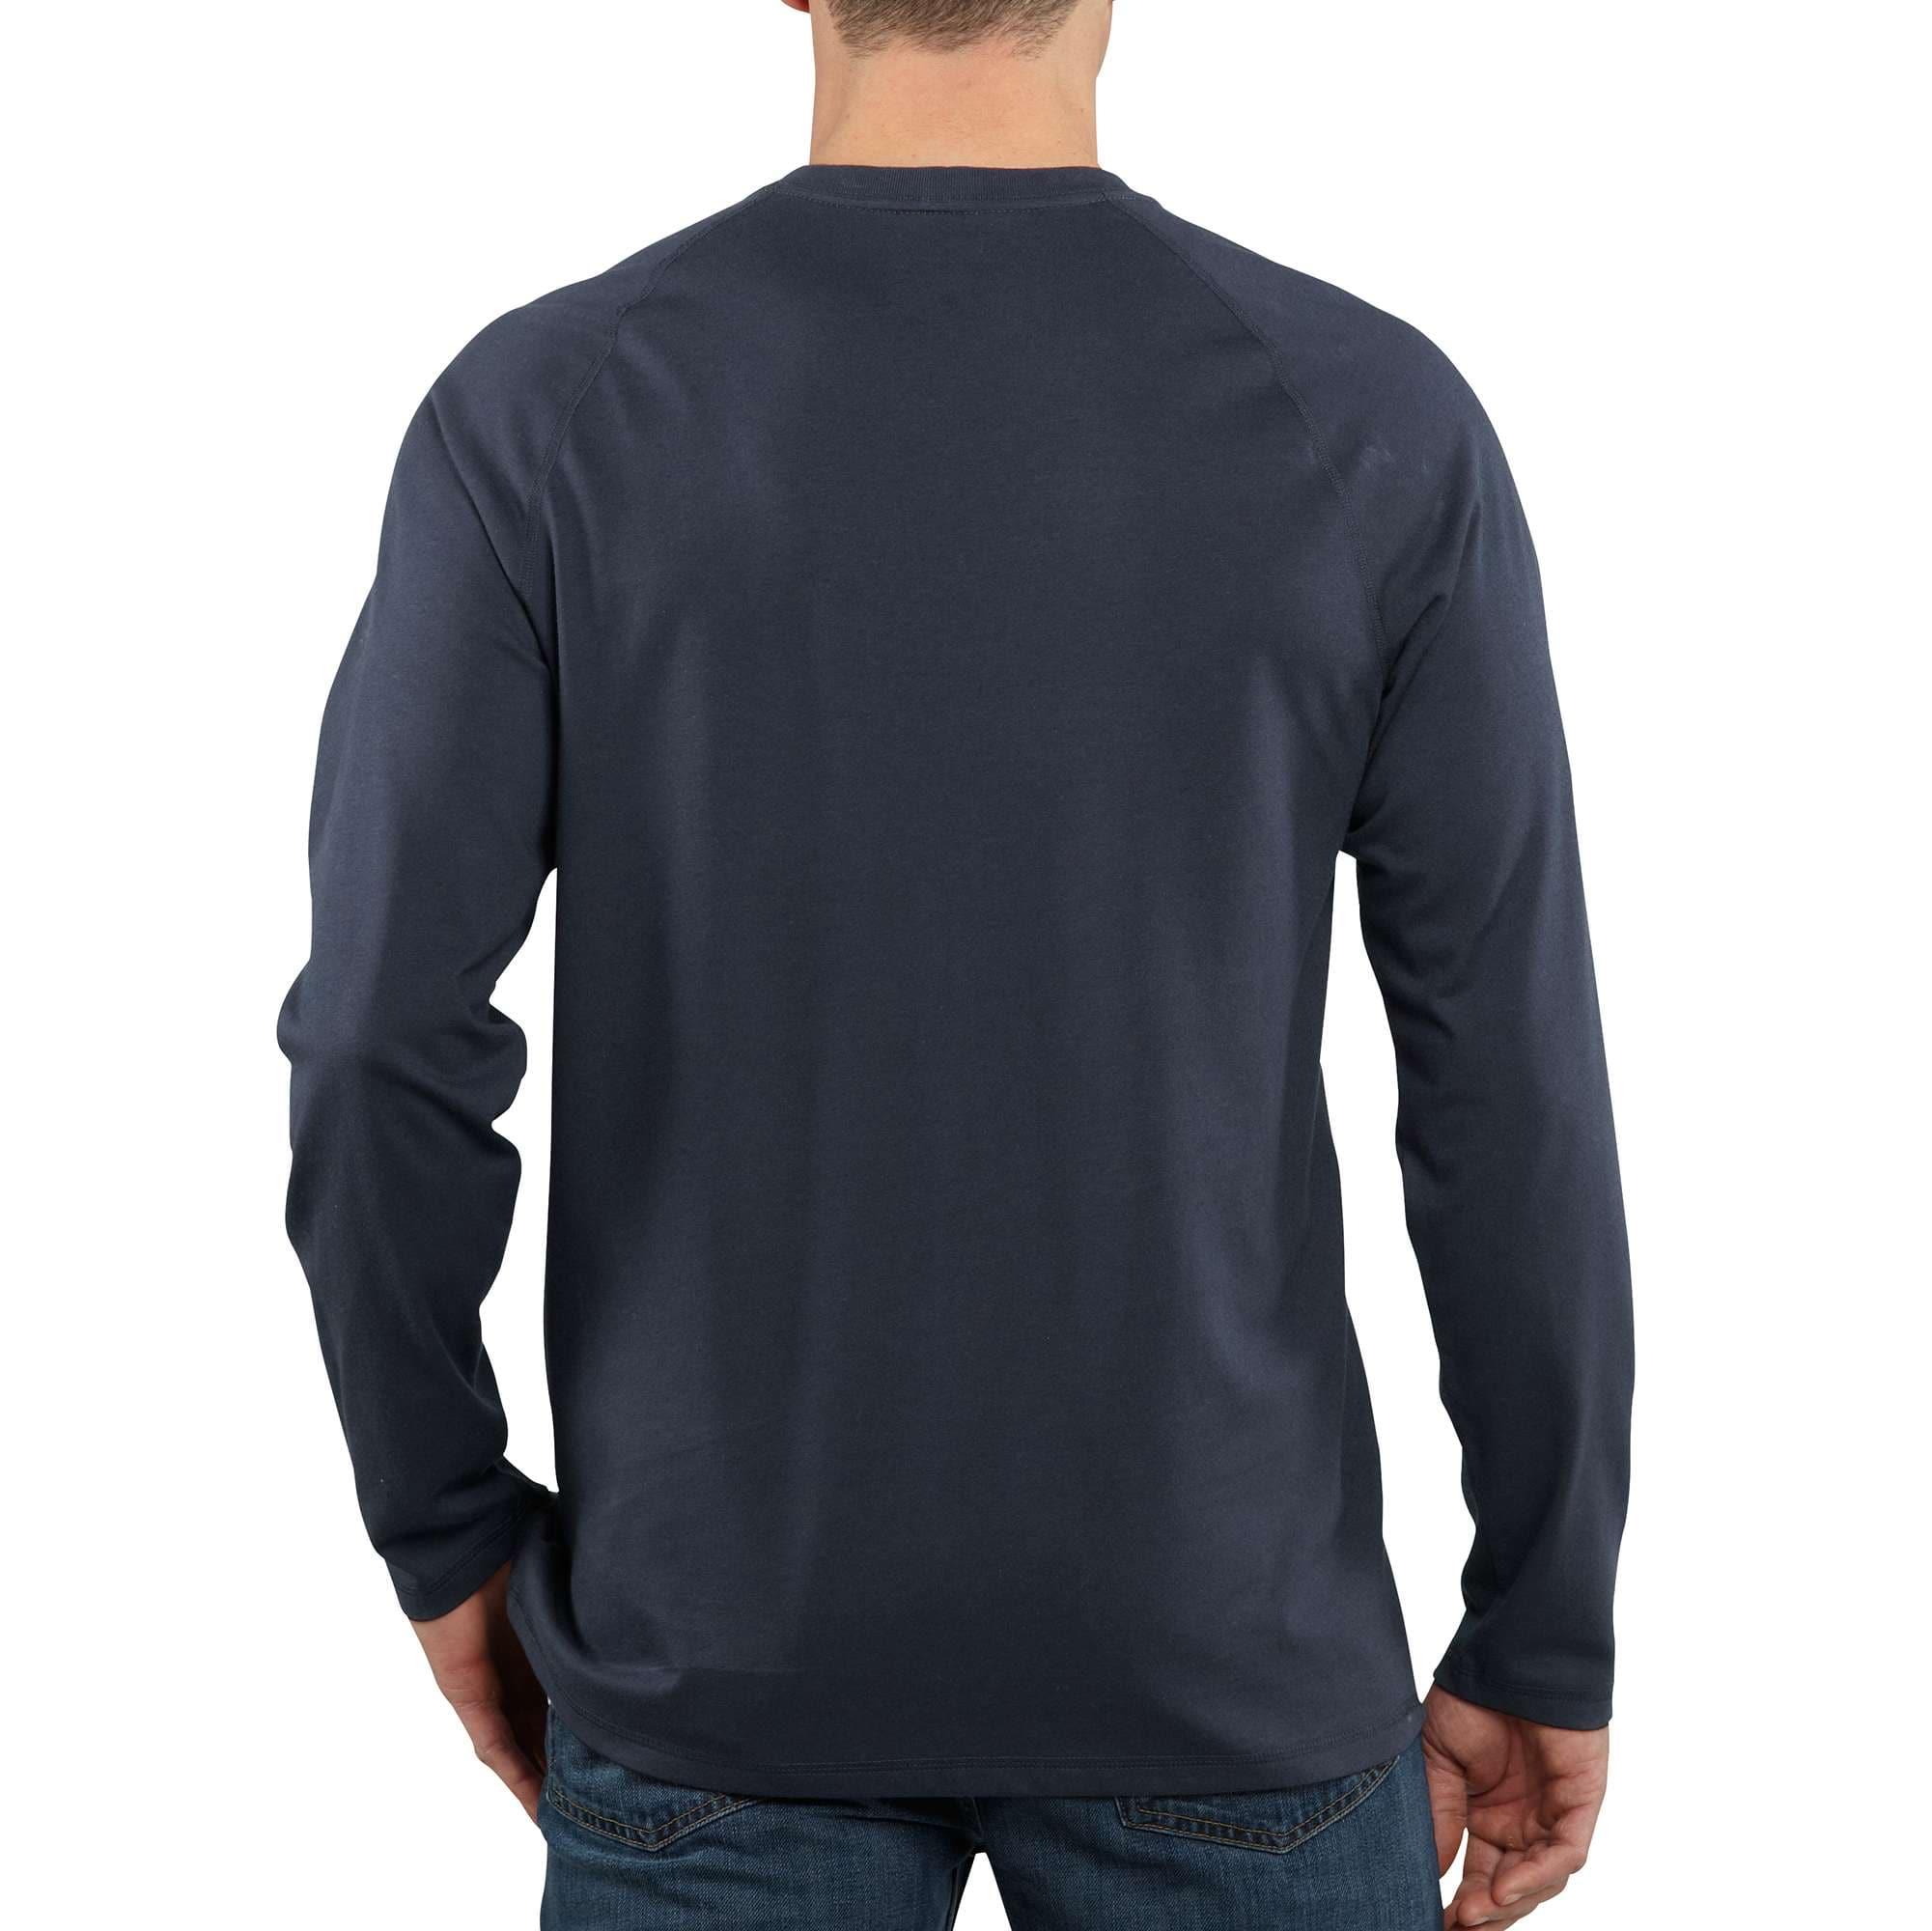 Carhartt Big /& Tall Force T-Shirt /à Manches Longues pour Homme Coton